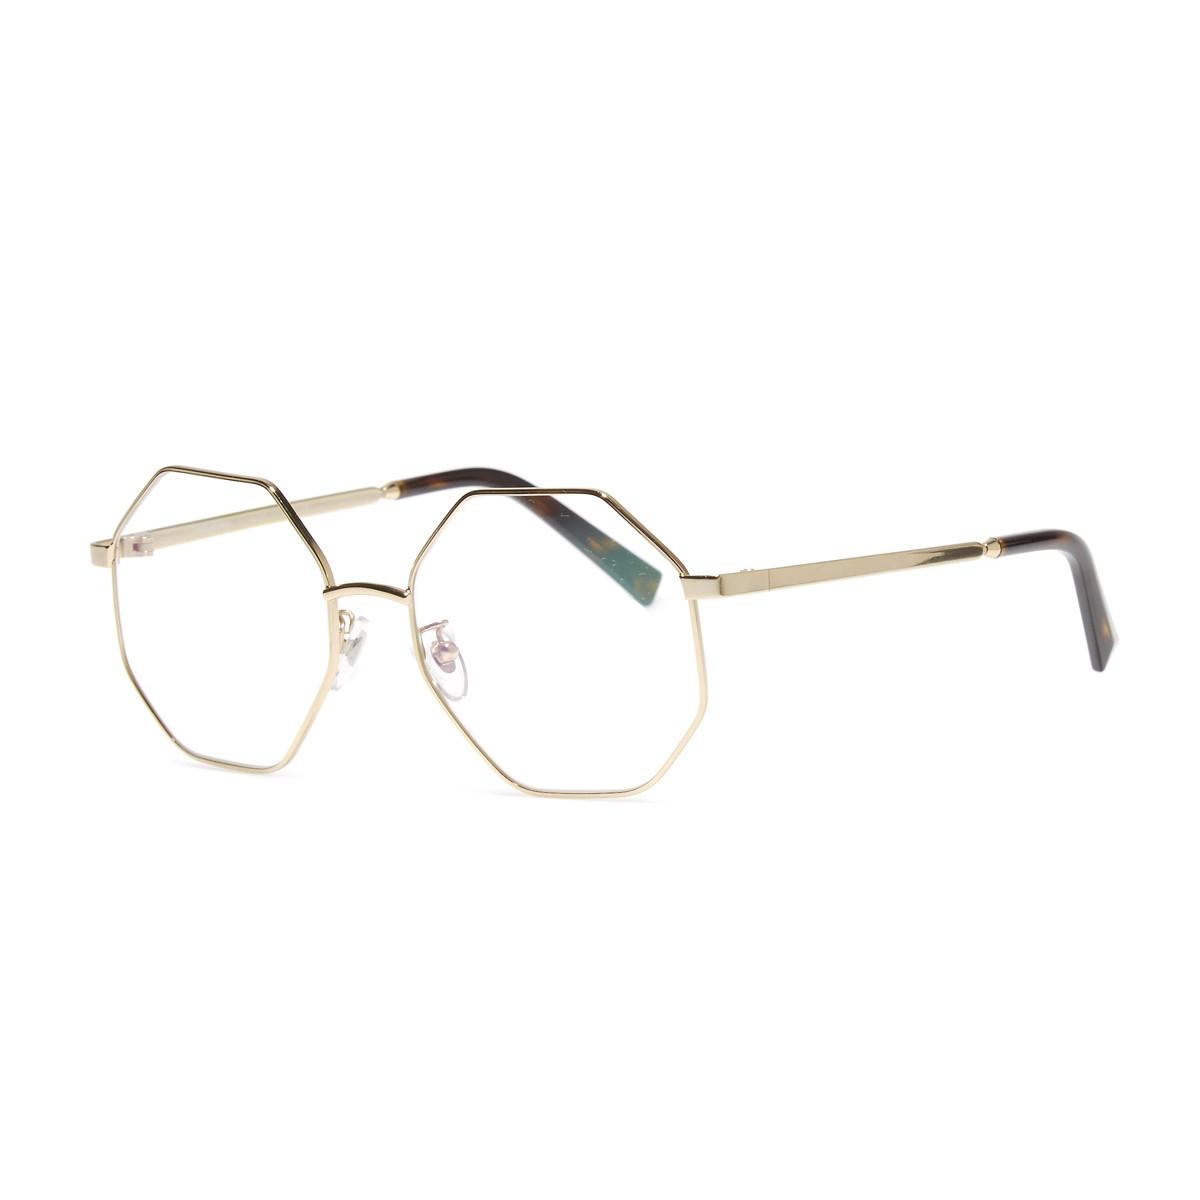 Bob Sdrunk Isabella | Women's eyeglasses